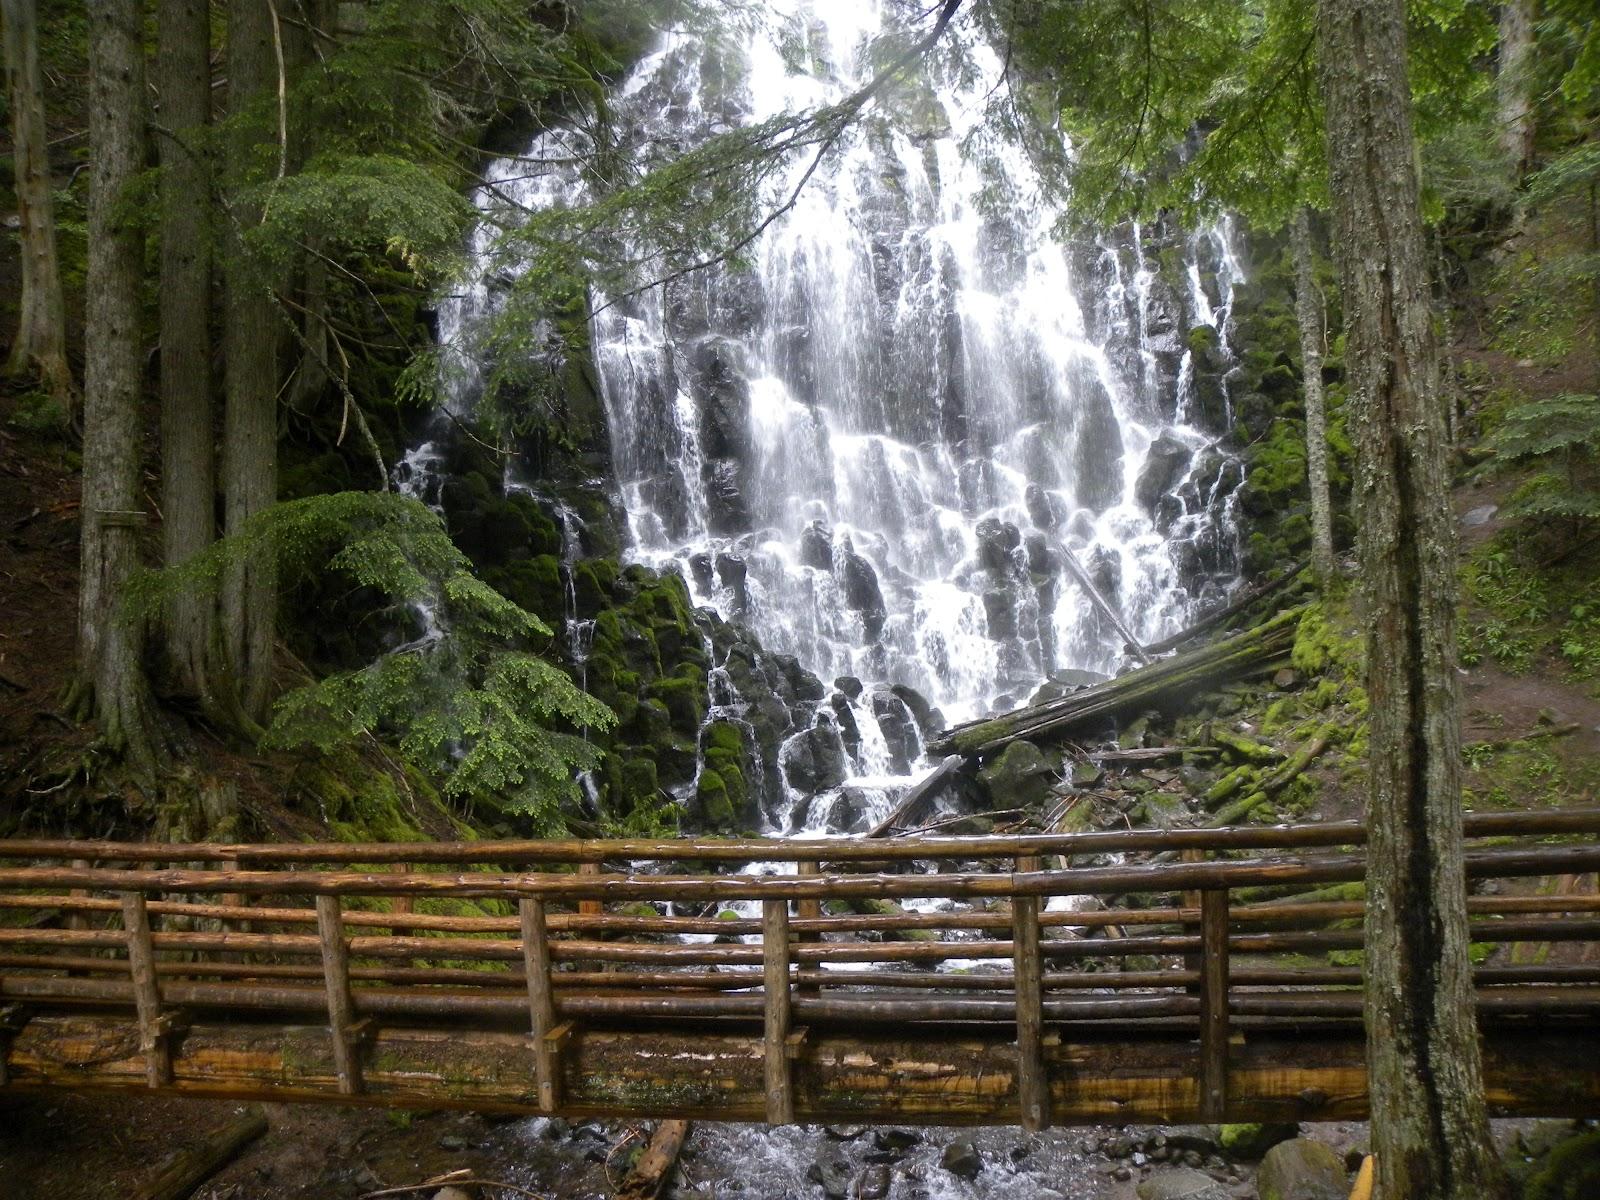 Portland Or Fall Had Wallpaper My Northwest Experience Hiking Ramona Falls